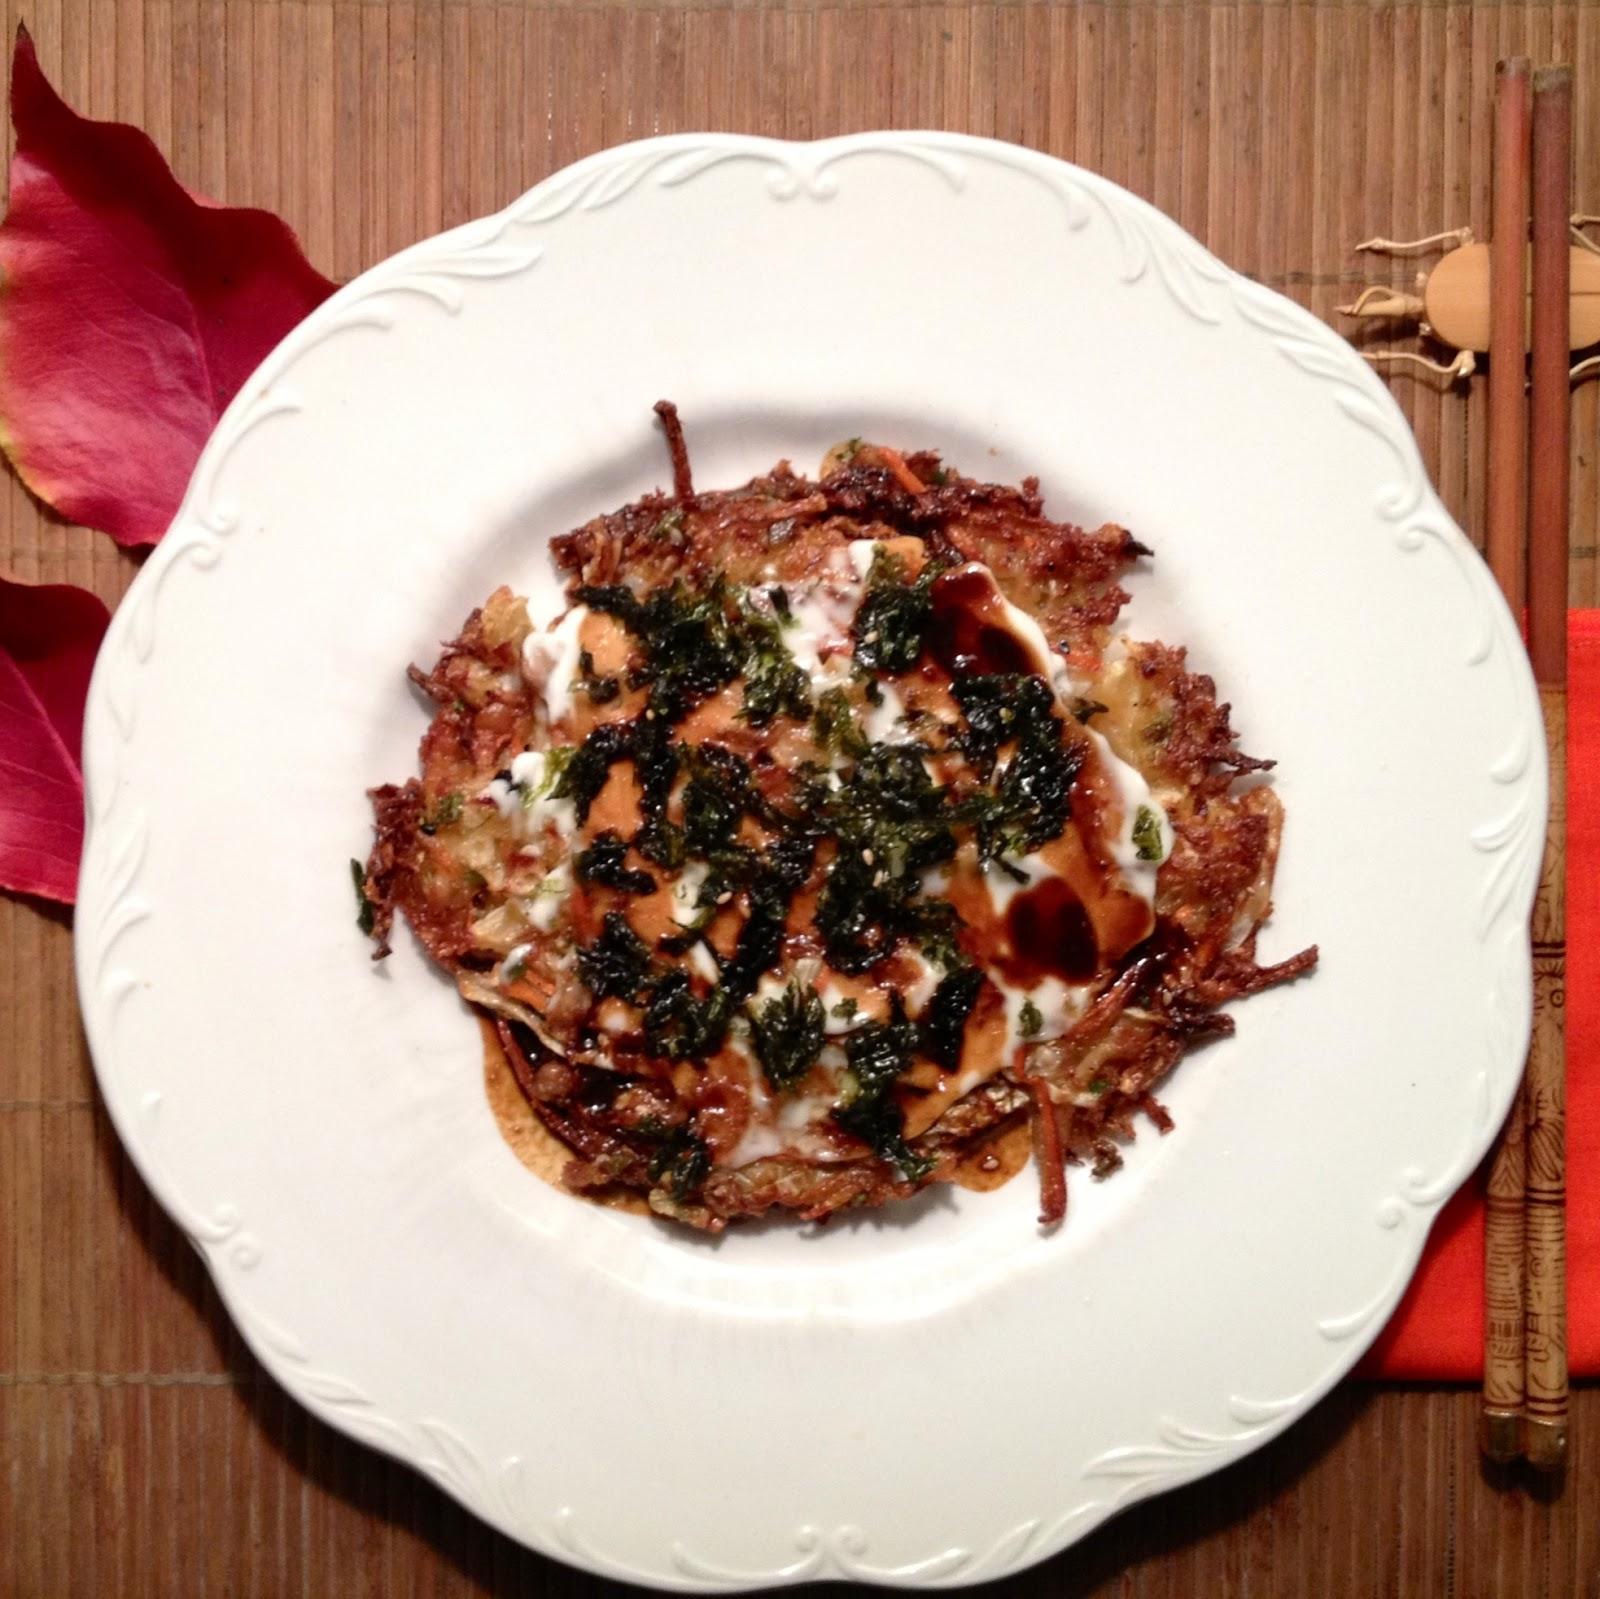 http://www.rubbercowgirl.com/2012/11/virtual-vegan-potluck-okonomiyaki.html